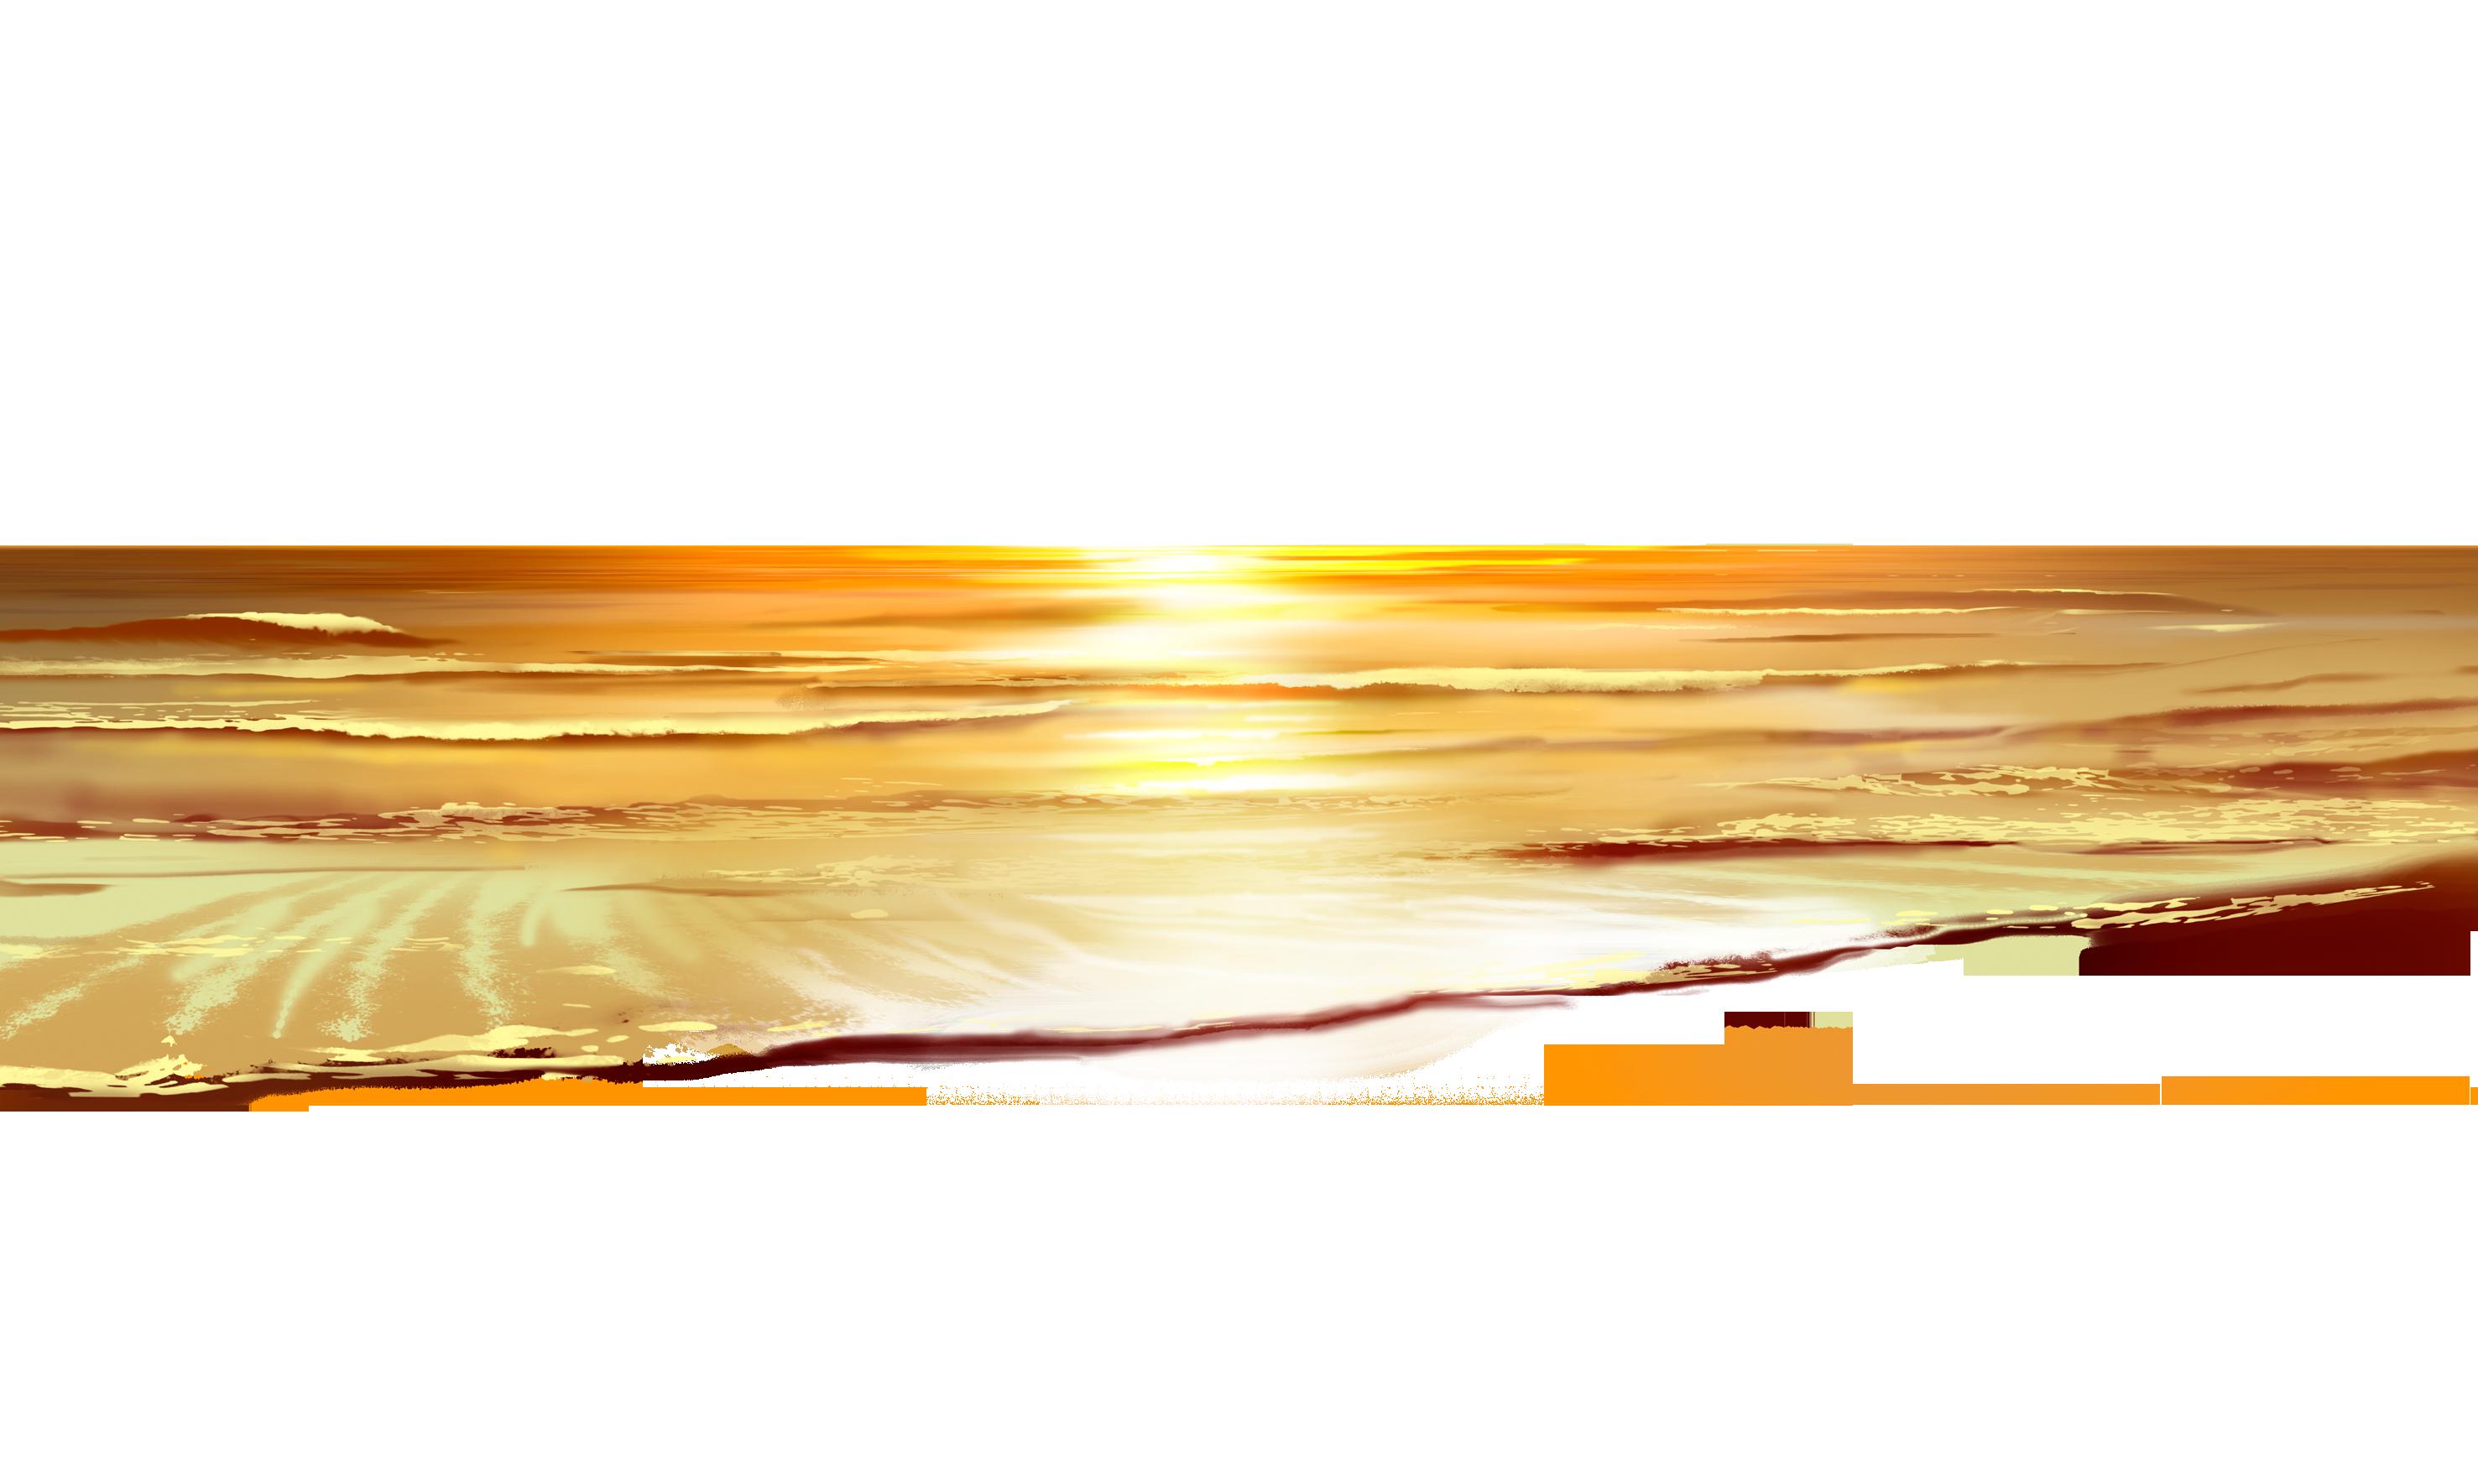 Sea sunset png pinterest. Ocean clipart ground